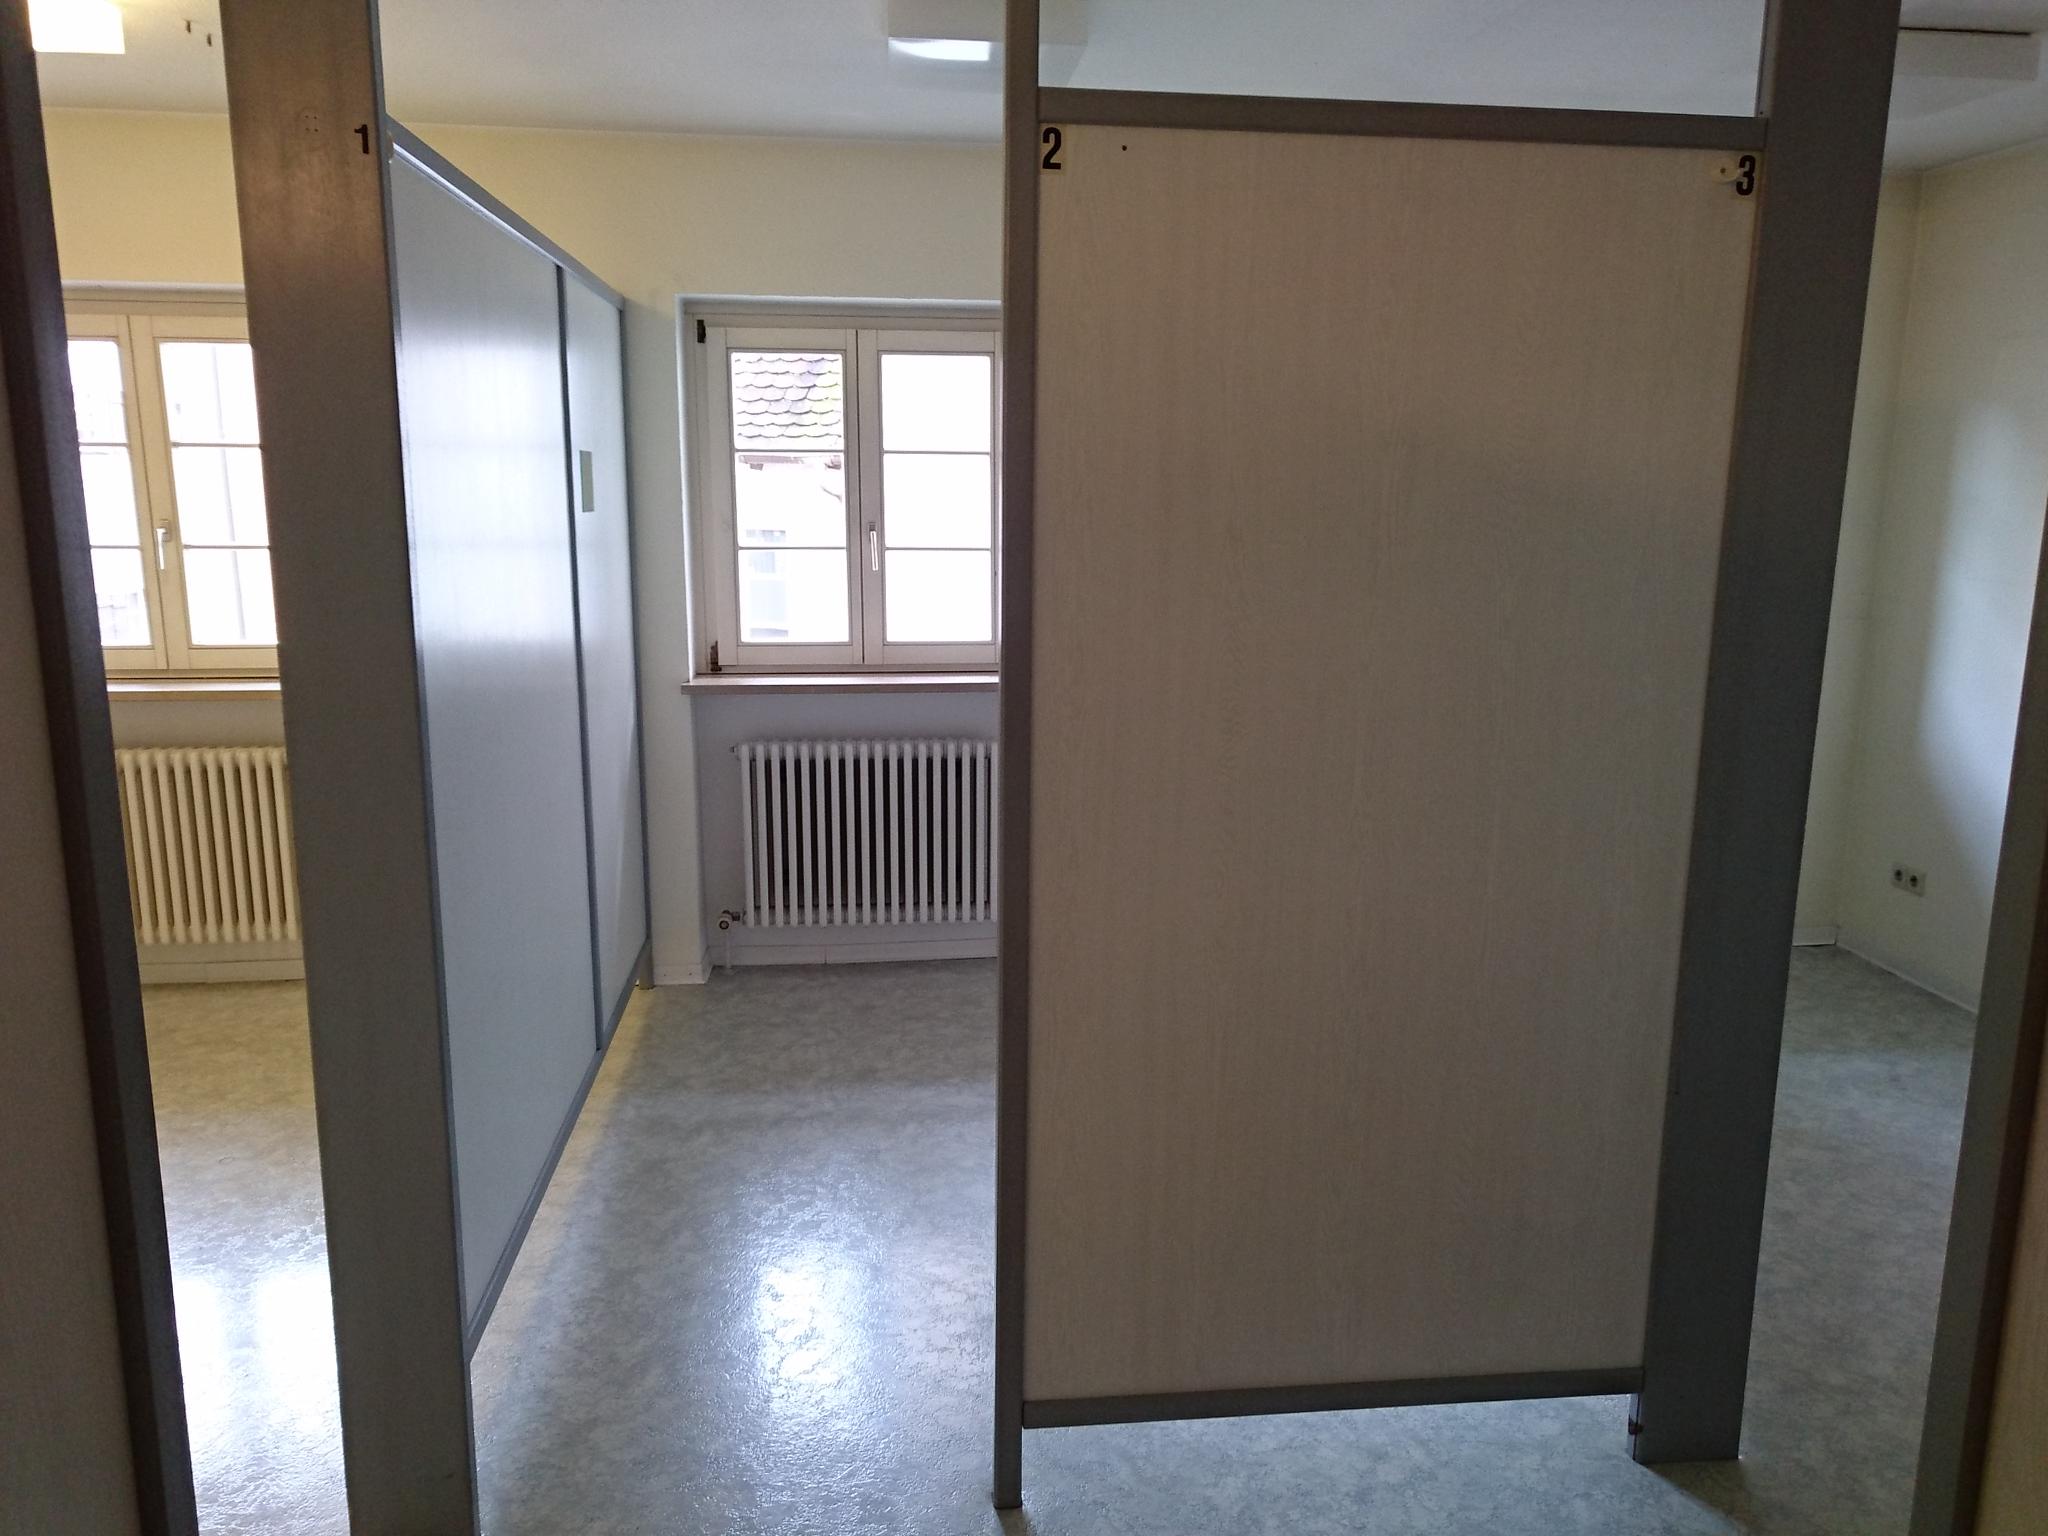 Umbau TCM-Praxis in Wangen im Allgäu - Bestand